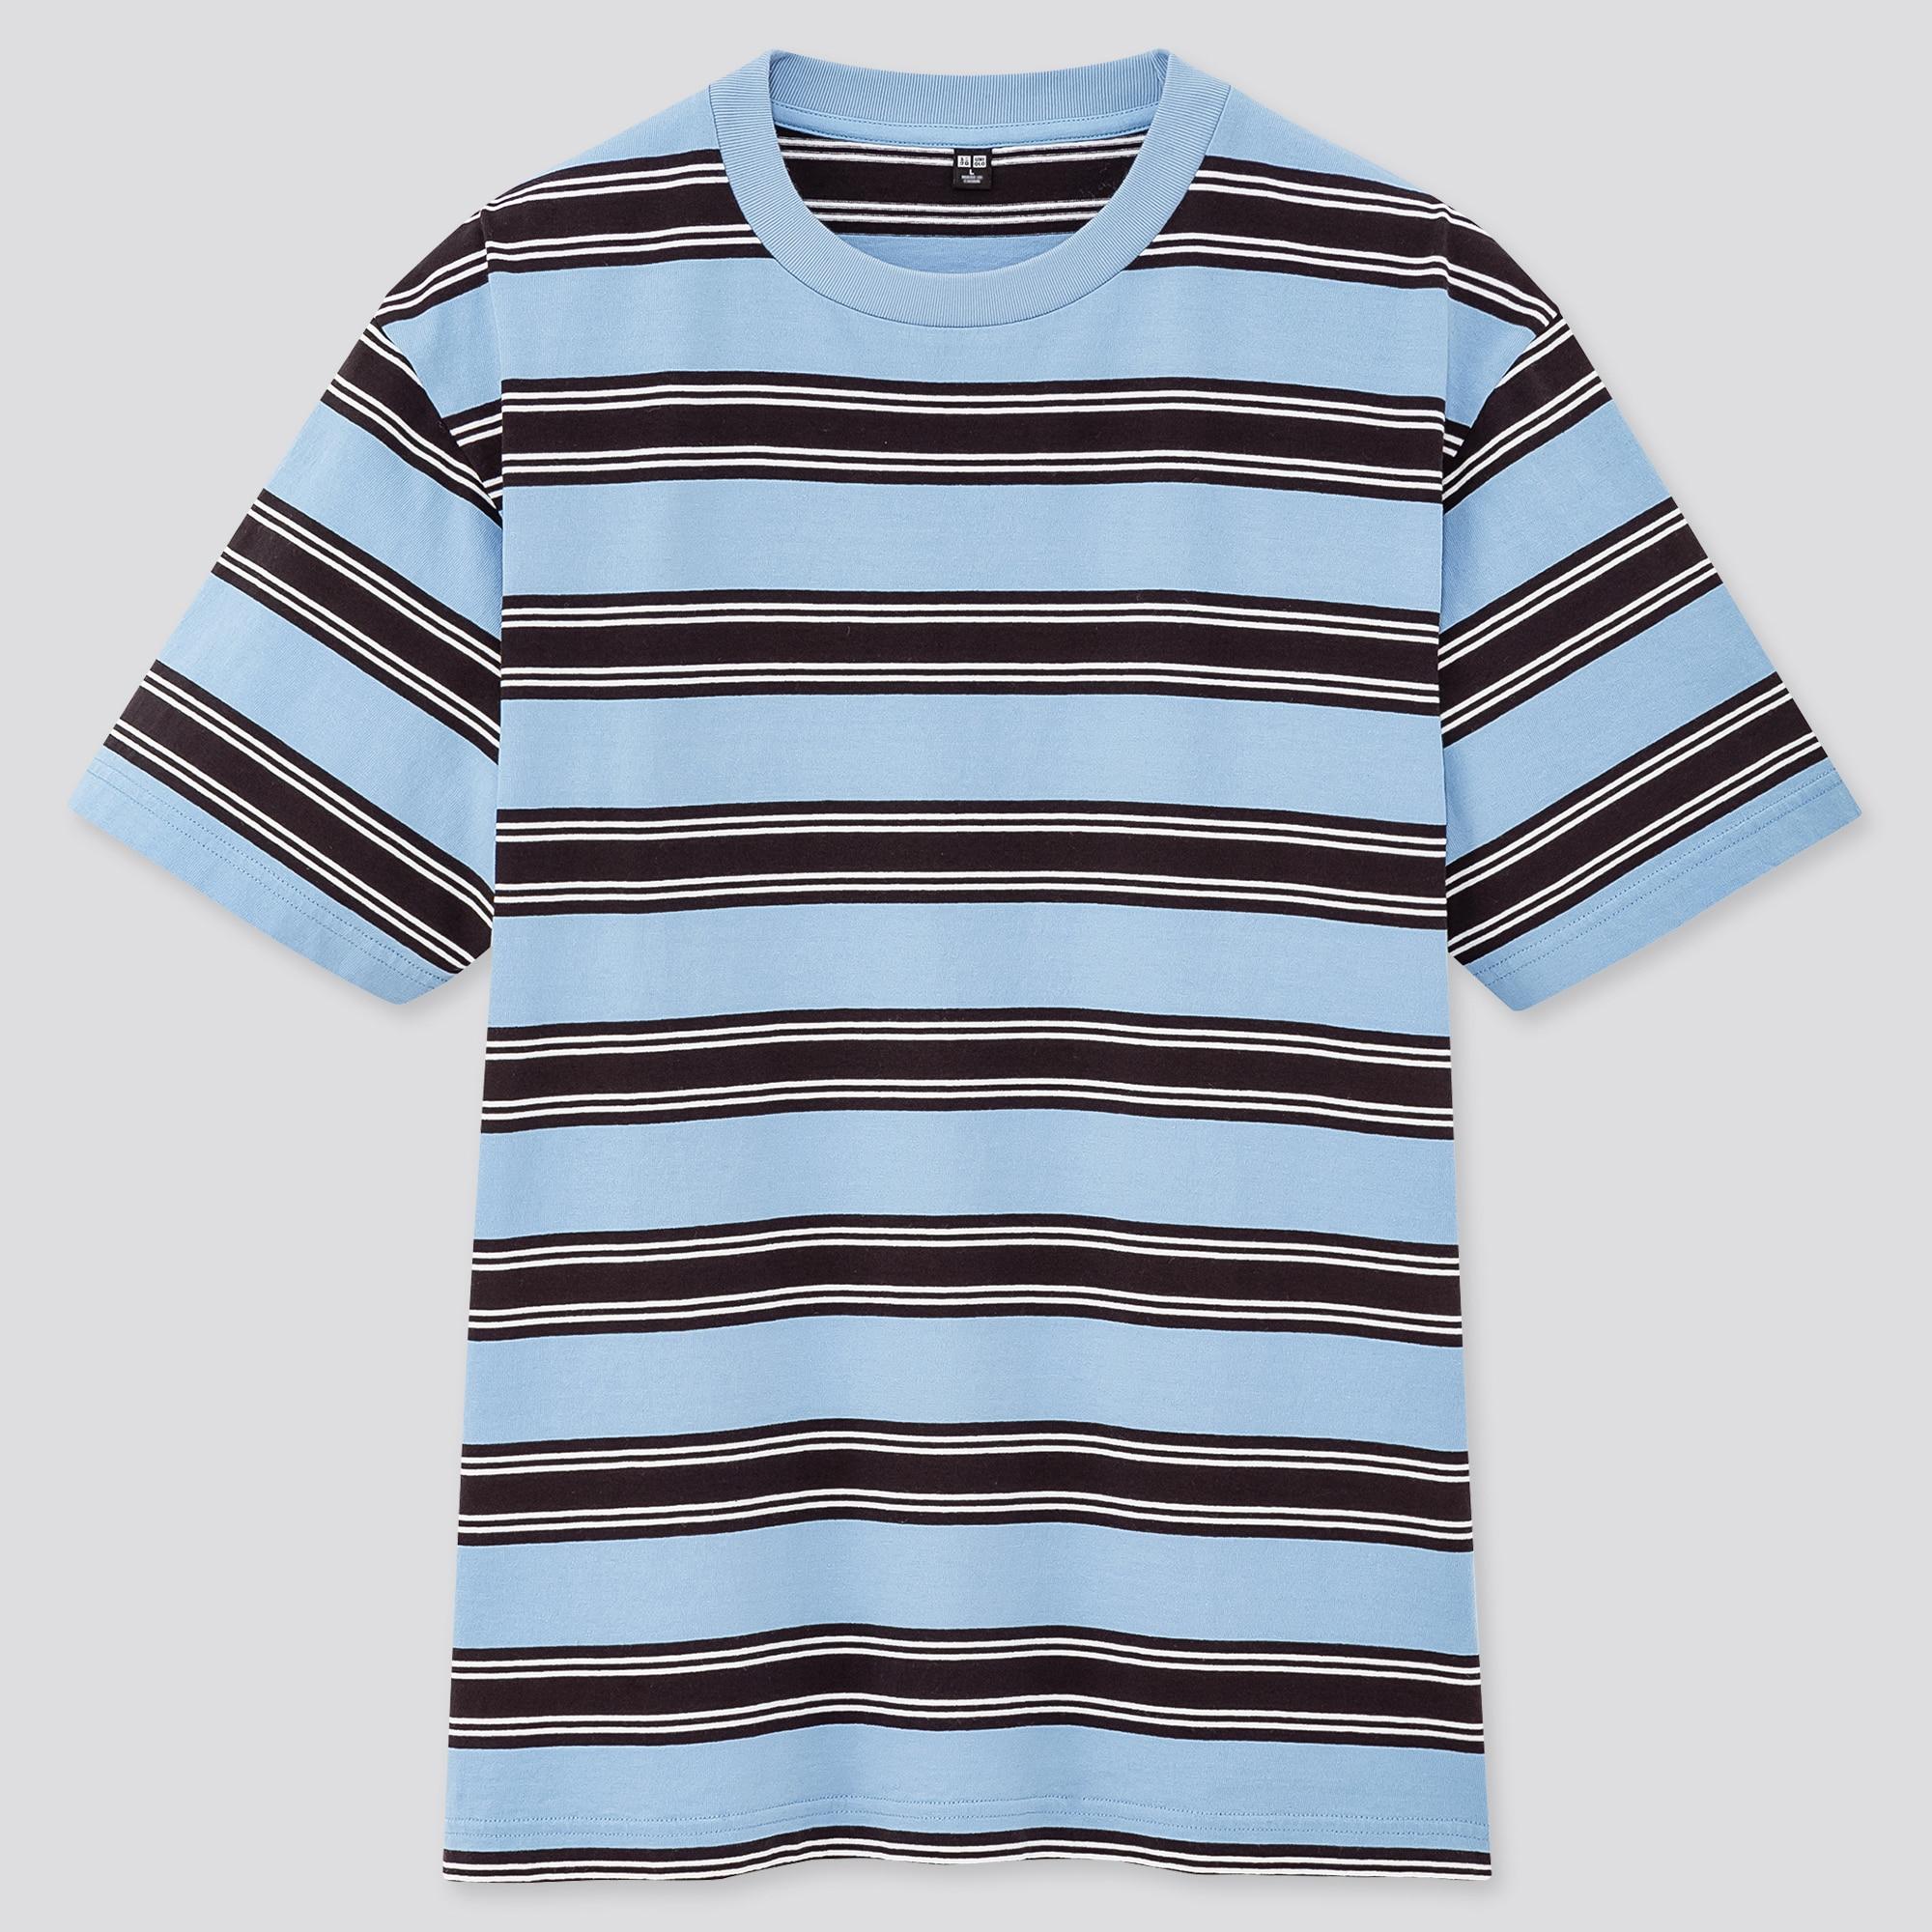 Uniqlo men striped short-sleeve t-shirt (online exclusive)